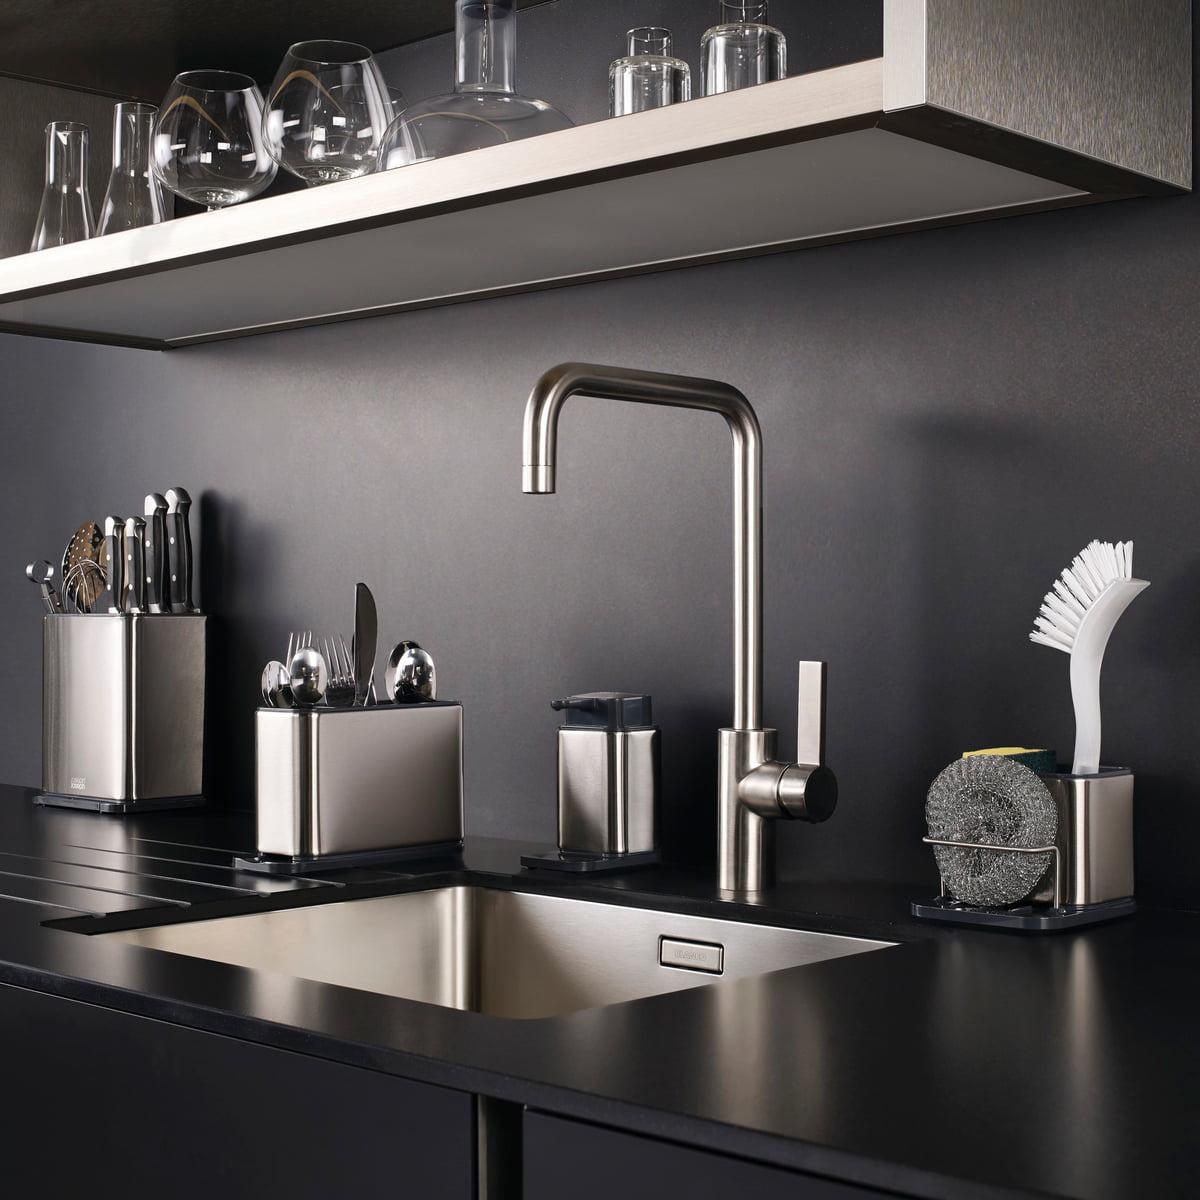 Surface Kitchen Accessories By Joseph